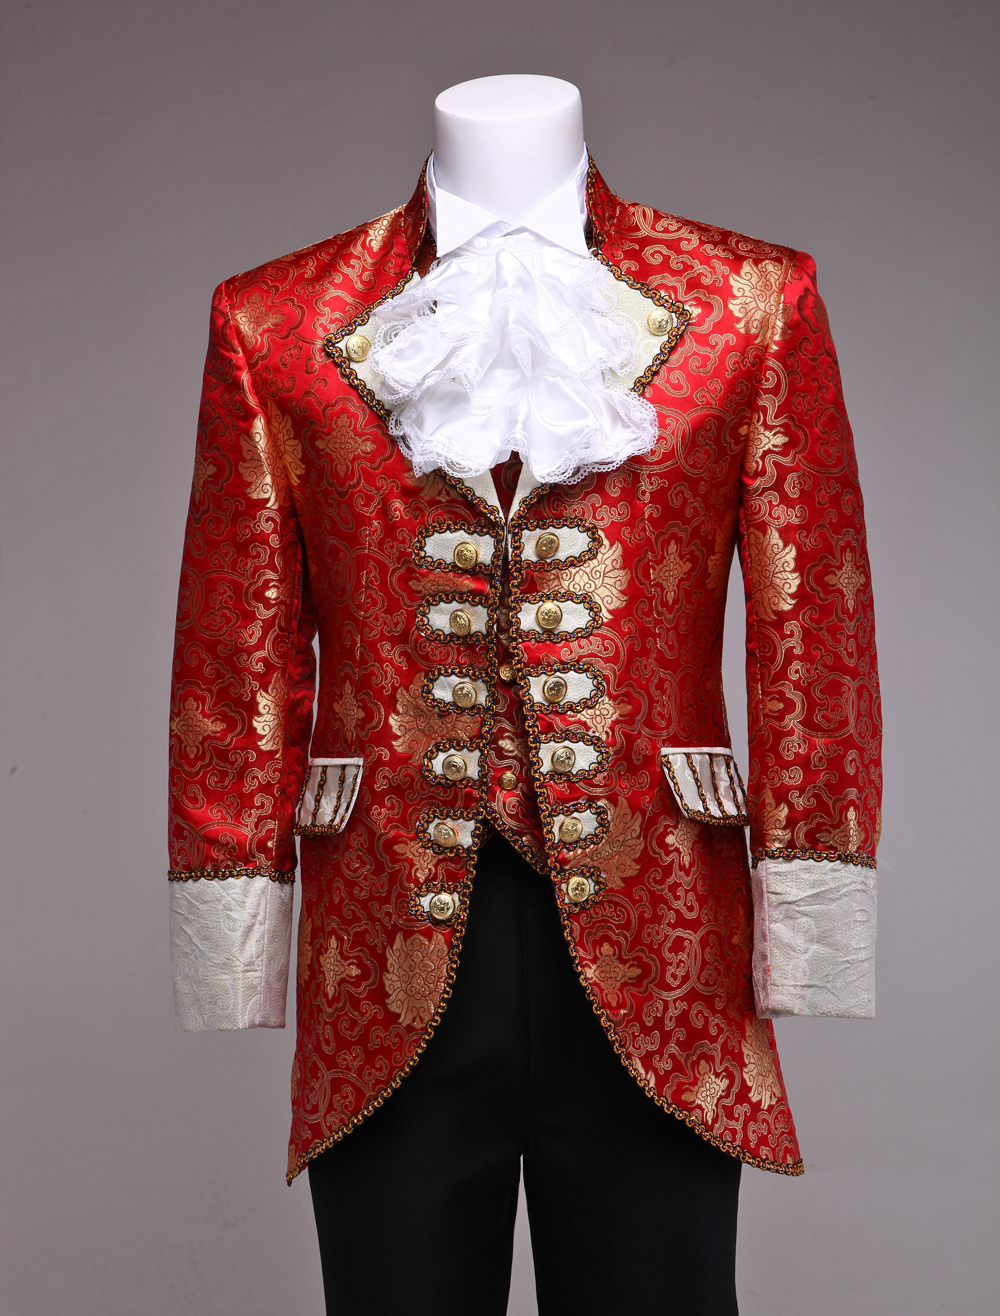 Retro Prince Costume Men S Red Jacquard European Vintage